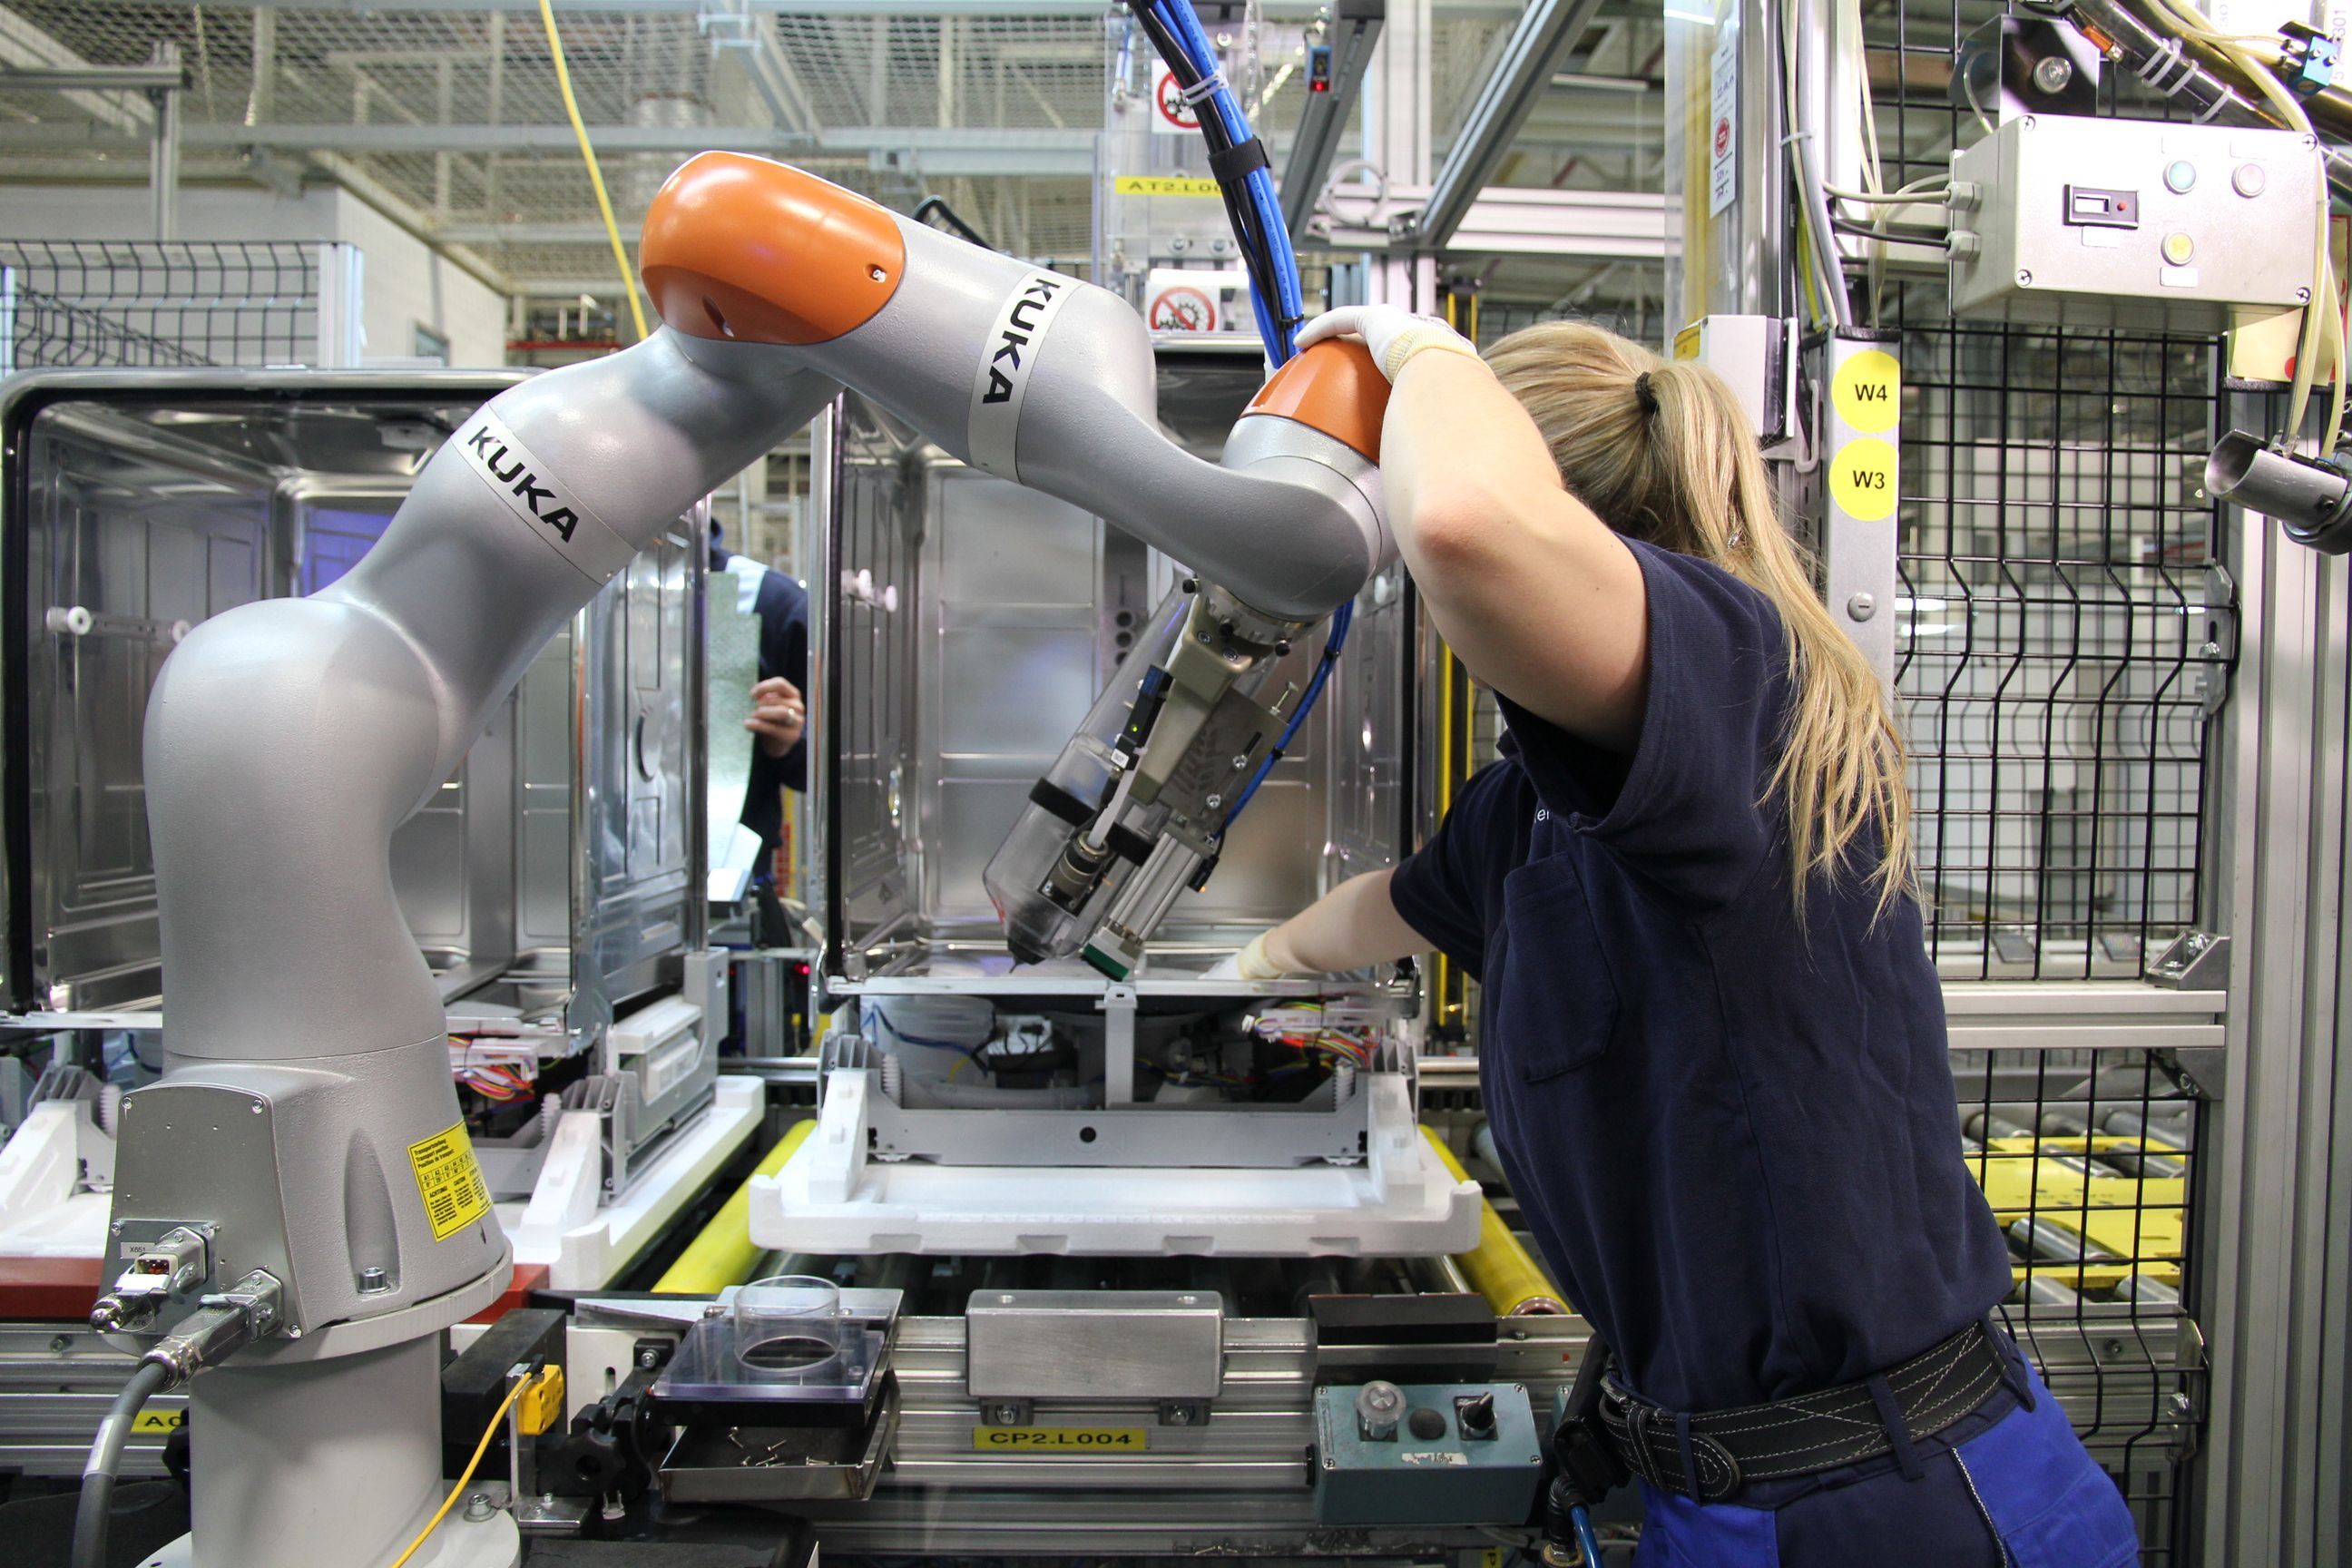 Robots-kuka_lbriwa_human_robot_collaboration